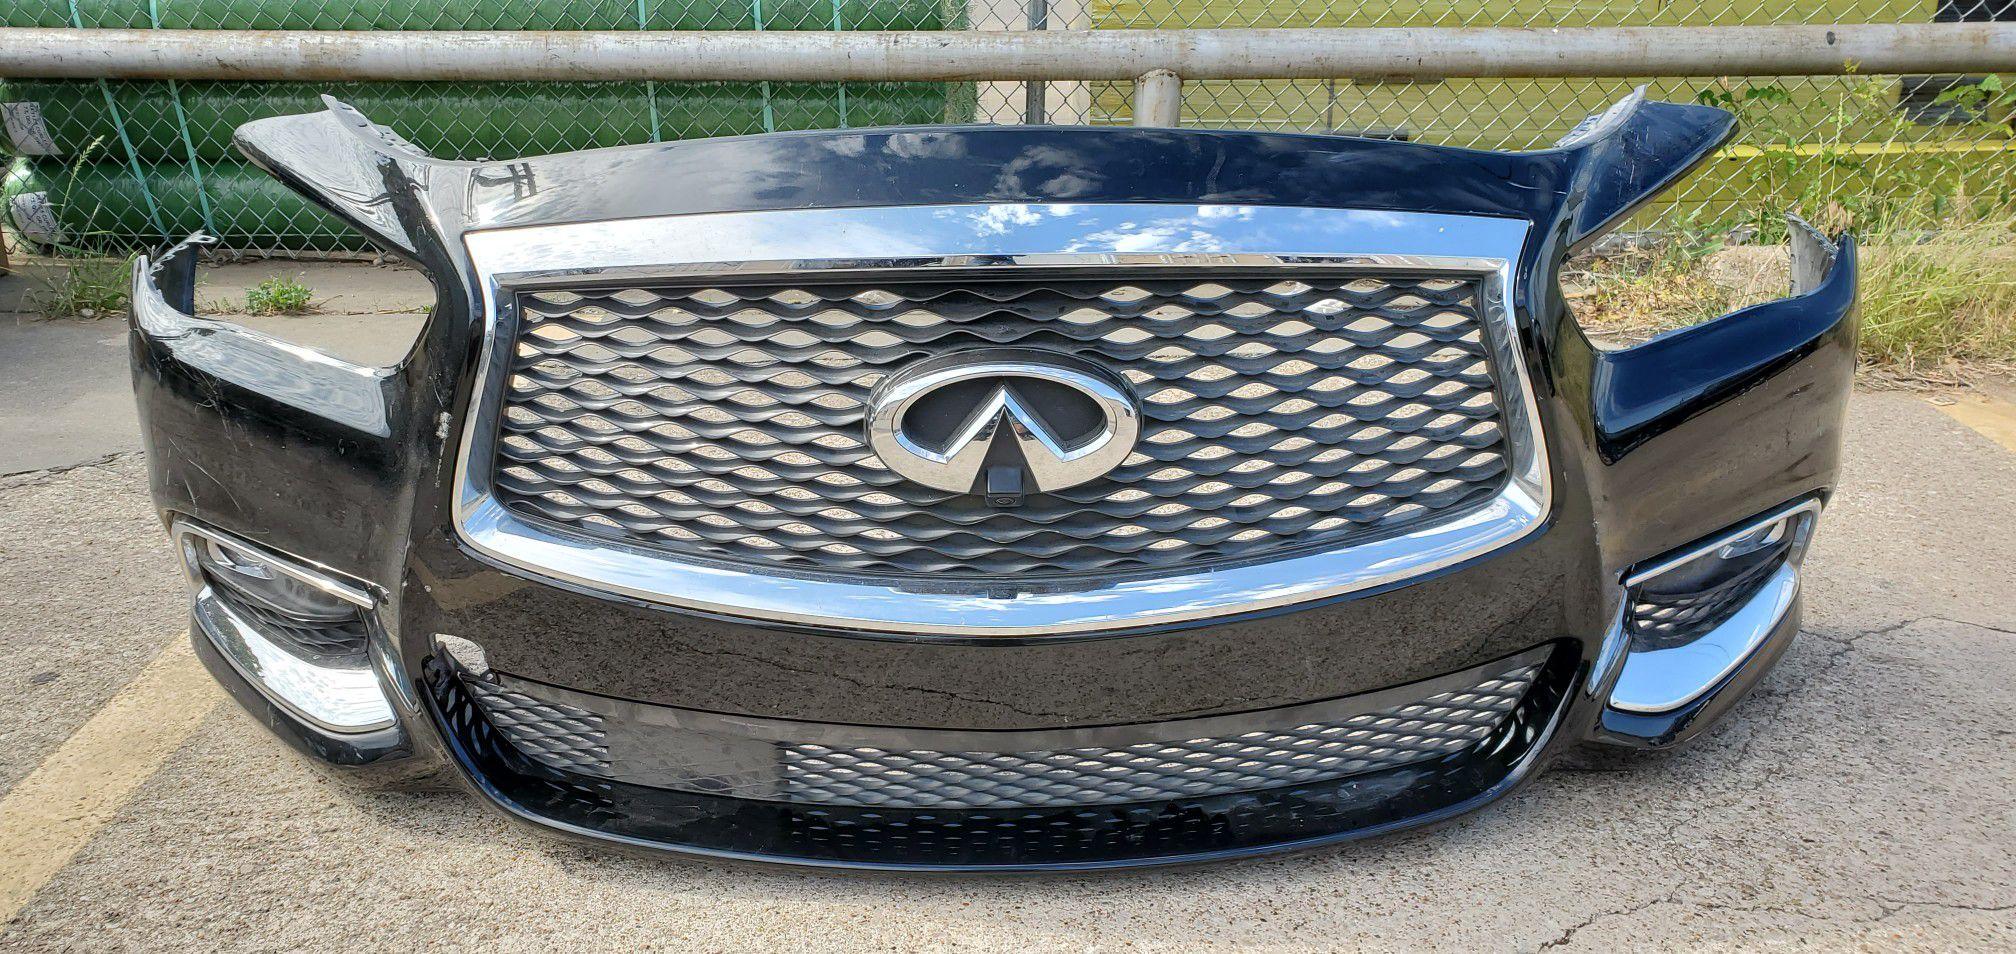 2016-19 Infiniti QX60 Complete front bumper